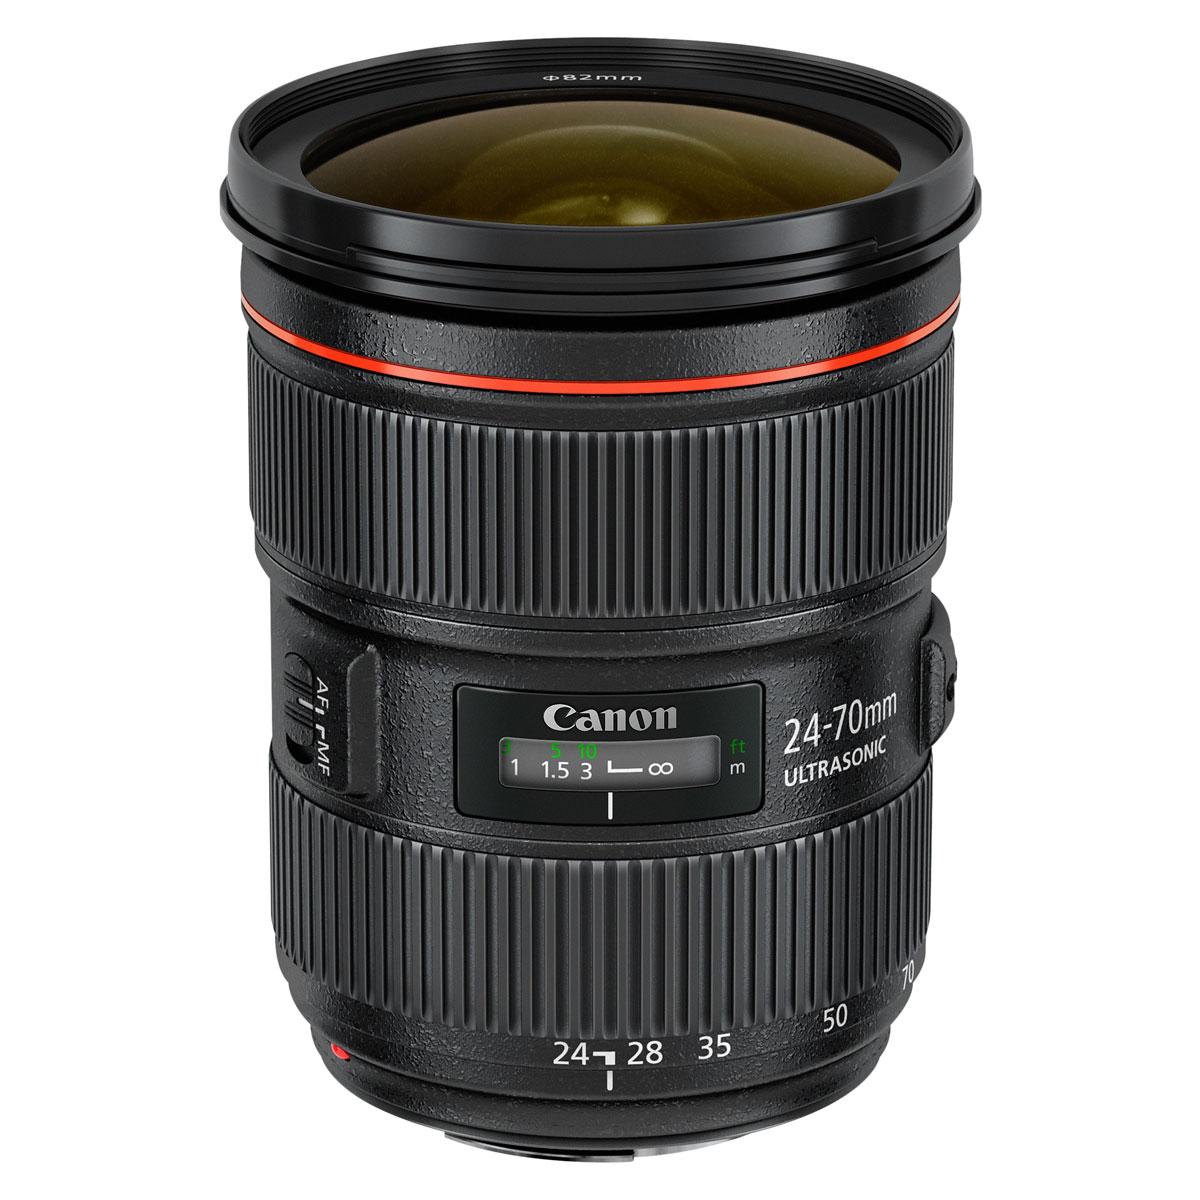 Objectif appareil photo Canon EF 24-70mm f/2.8L II USM Zoom standard